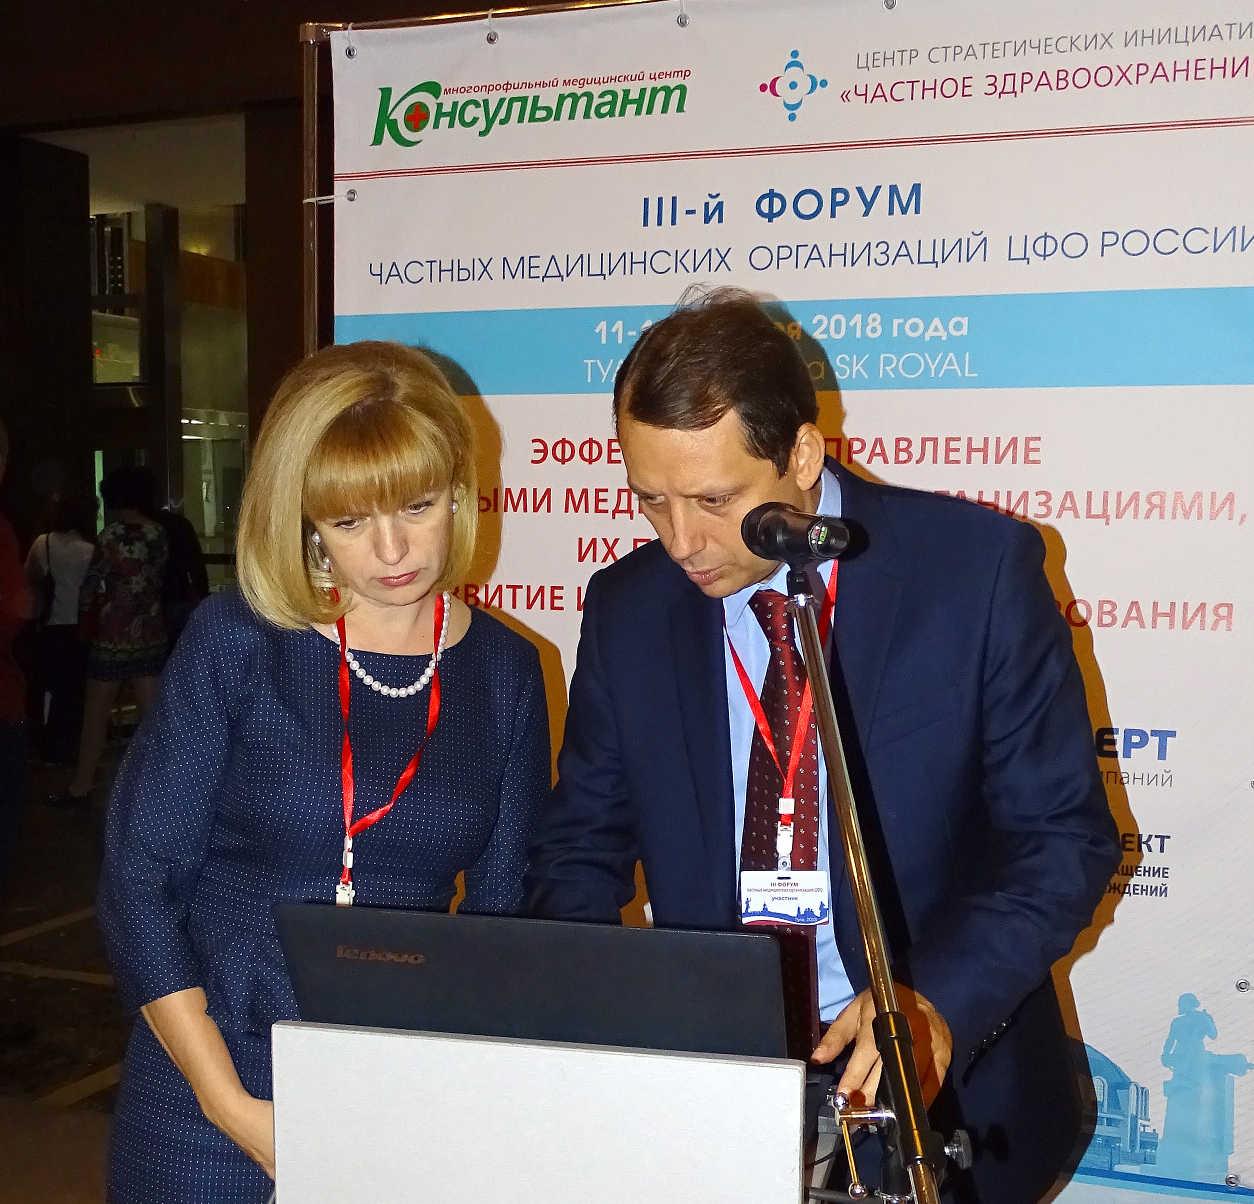 Фото III-го Форума частных медицинских организаций ЦФО N 17